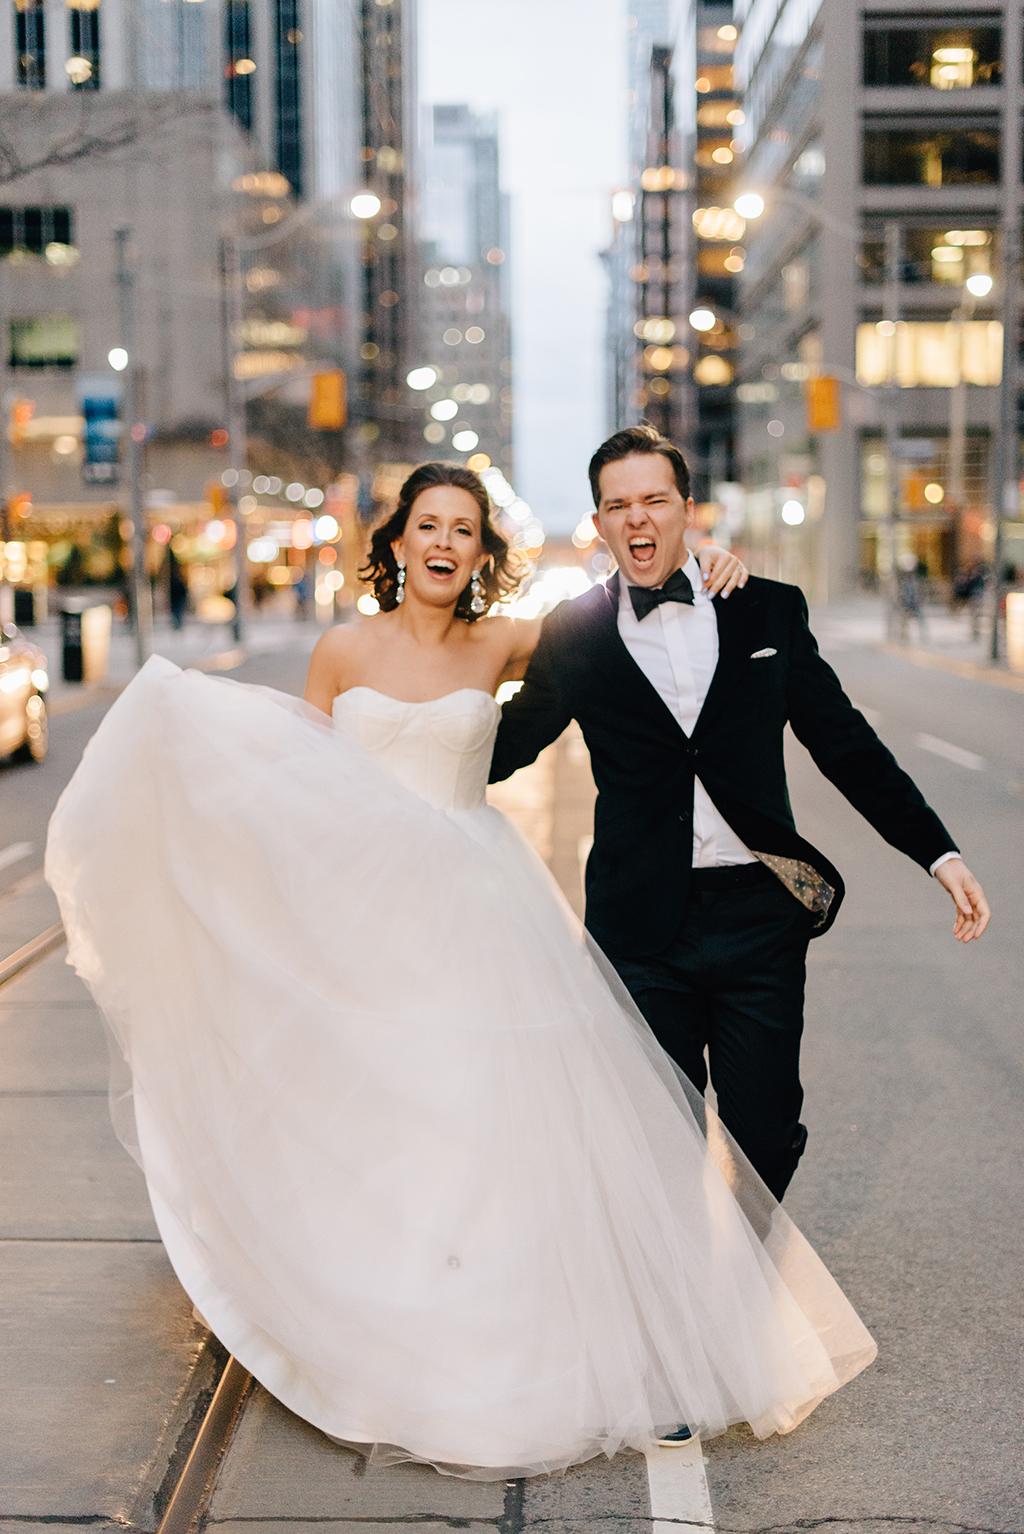 Documentary-Wedding-Photographer-16-1.jpg